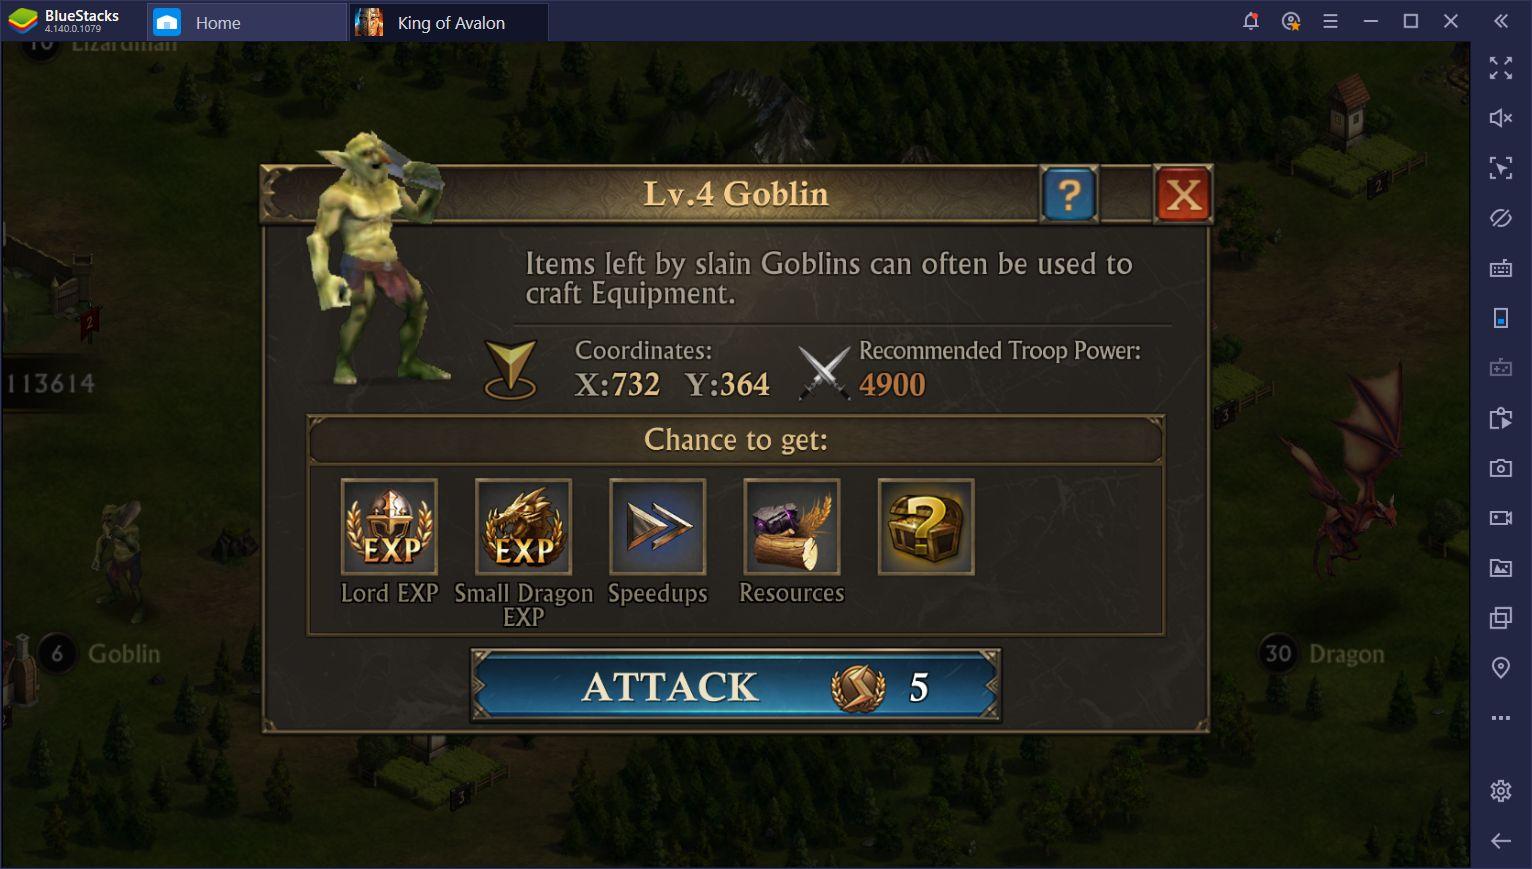 BlueStacks Macros for King of Avalon on PC